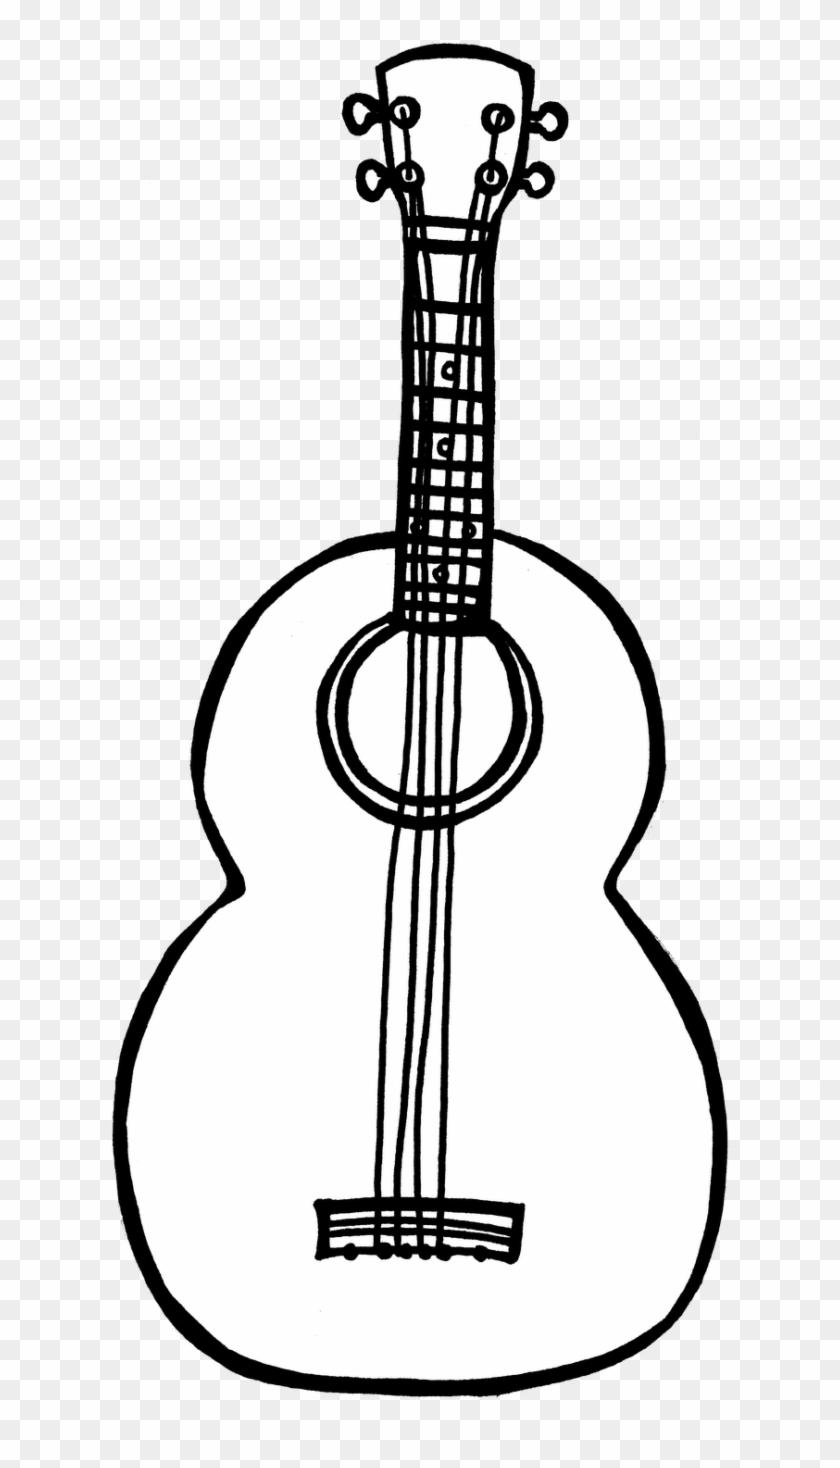 Sense - Of - Hearing - Clipart - Ukelele Clipart Black And White #60649